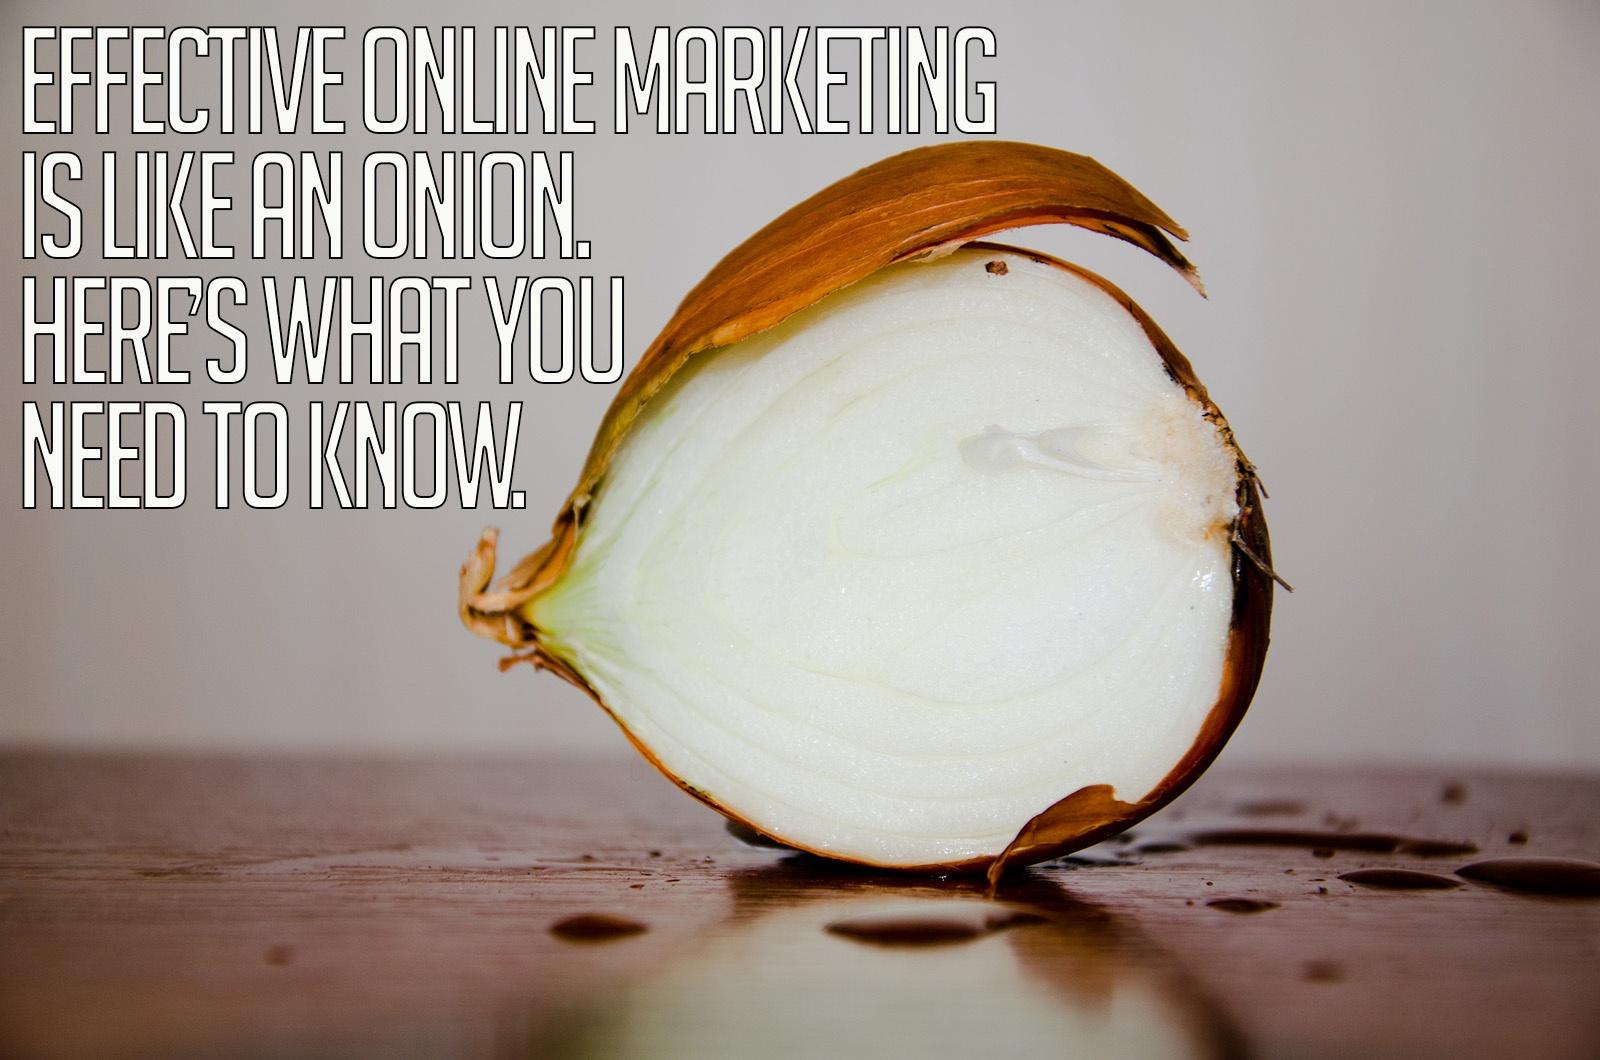 online marketing onion.jpg